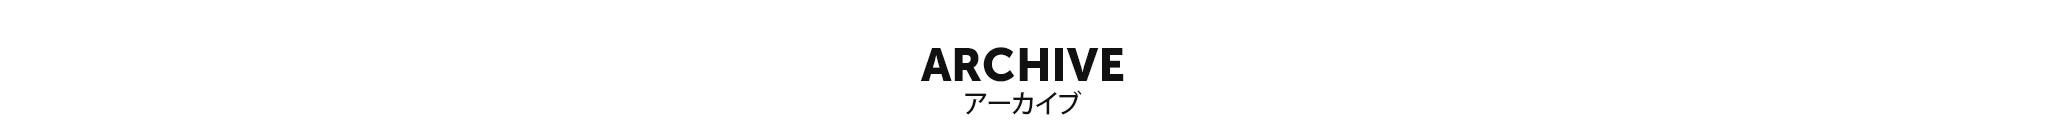 Baby Precious Archive